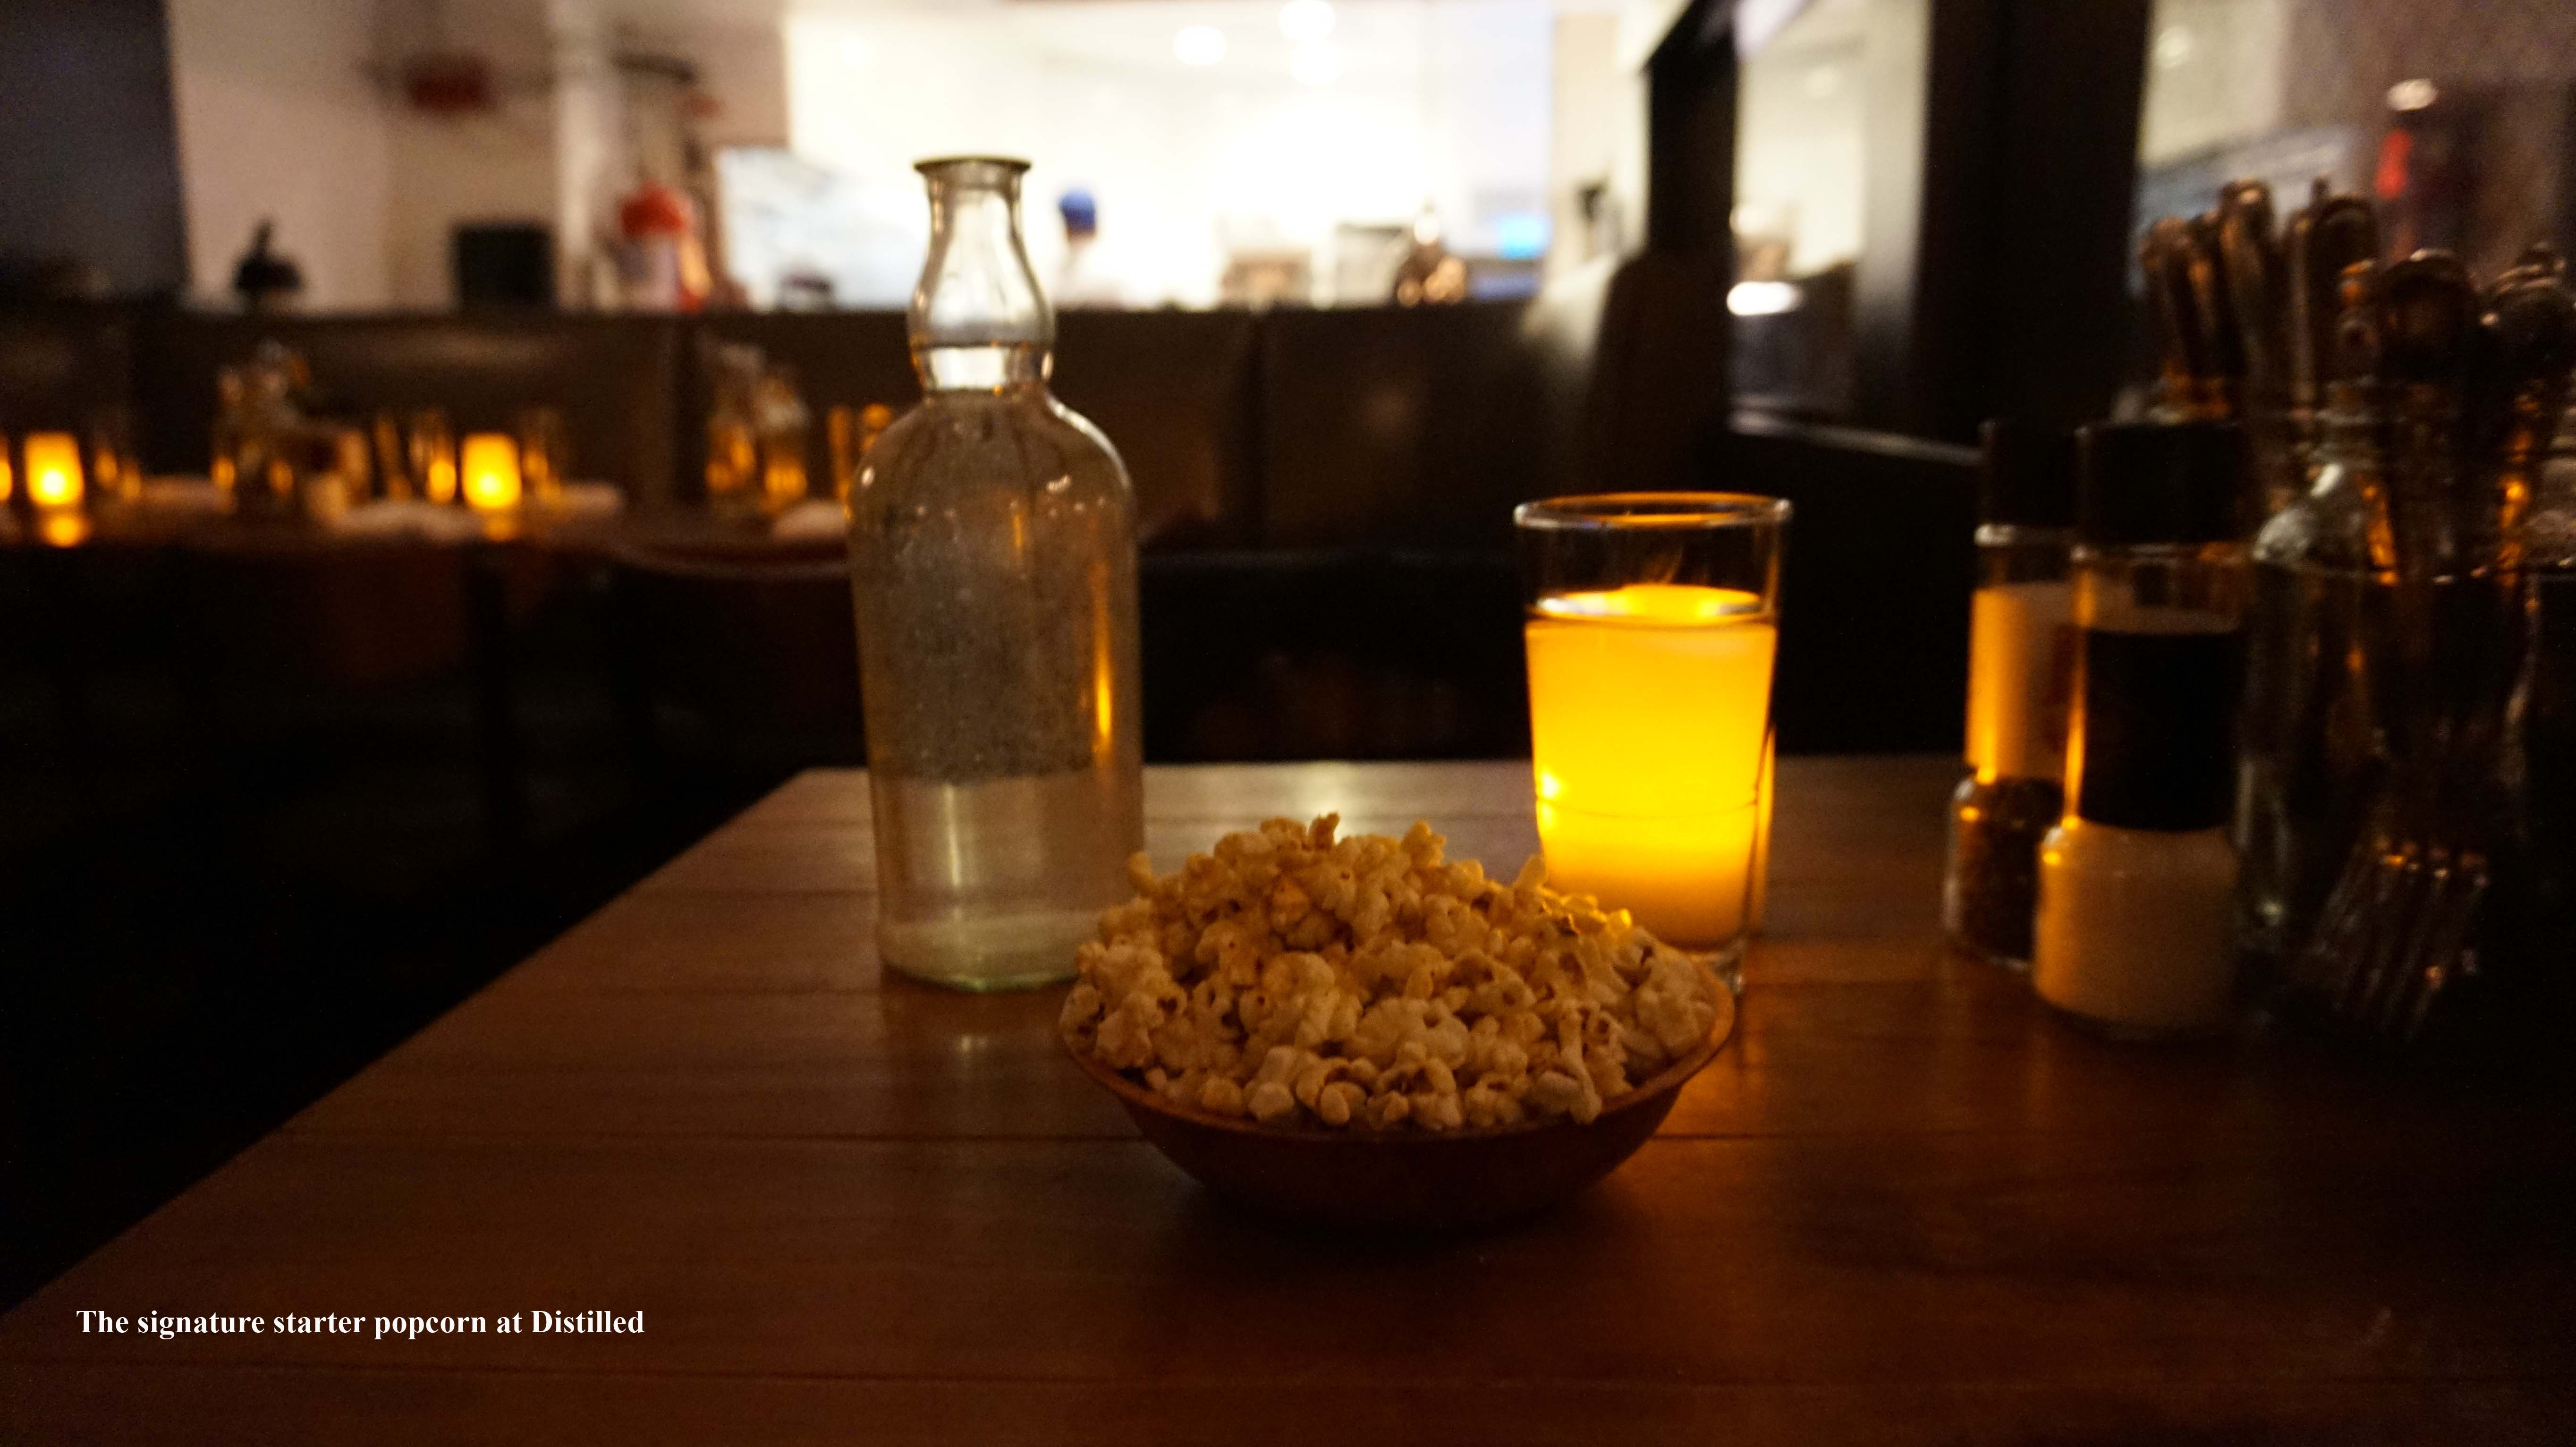 Popcorn Distilled